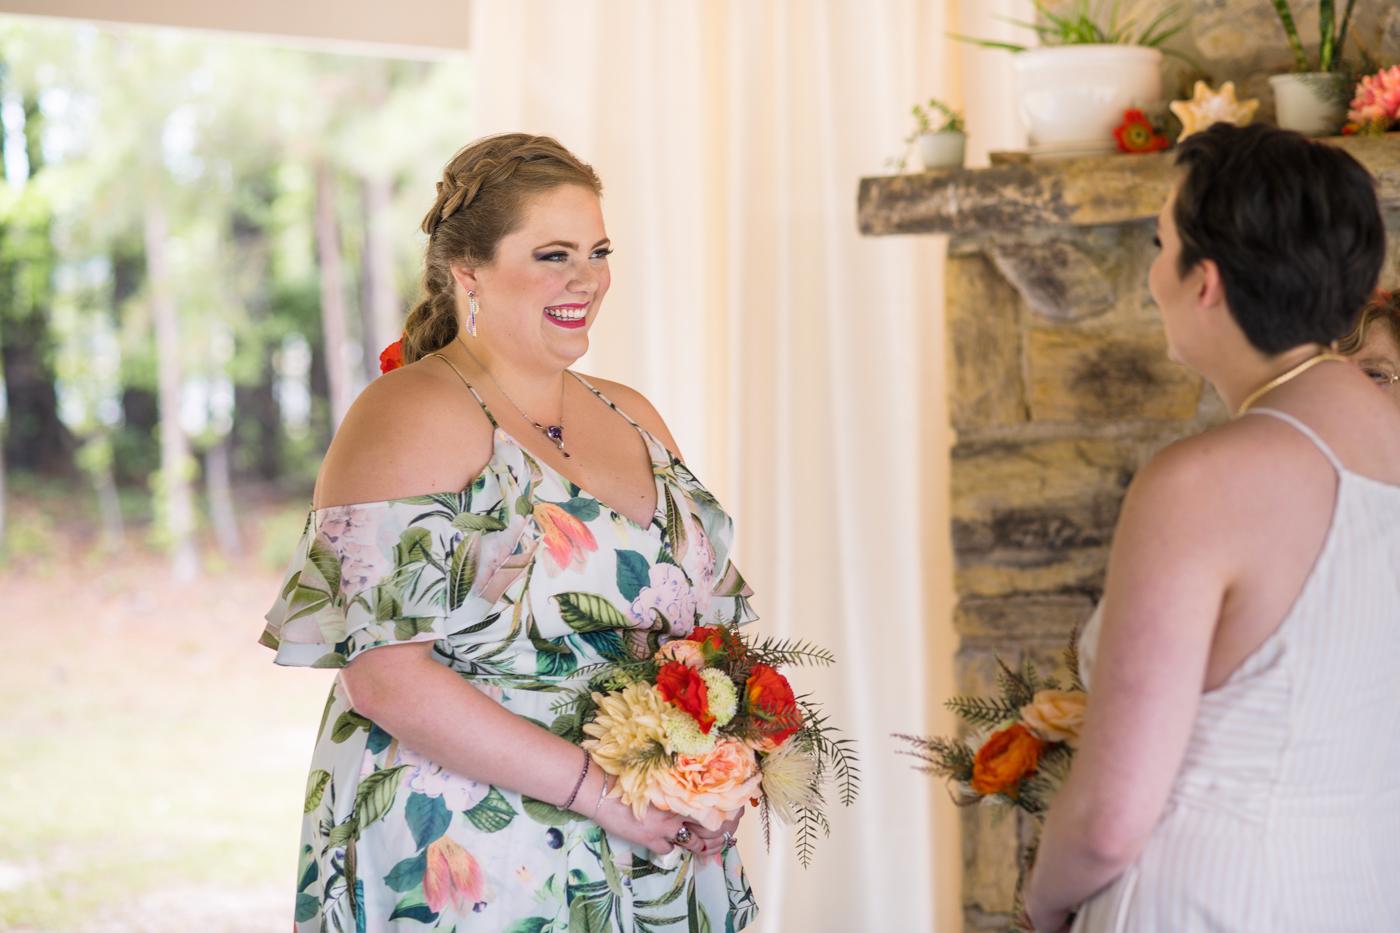 brides exchange vow during ceremony at Bill Scott Pavilion